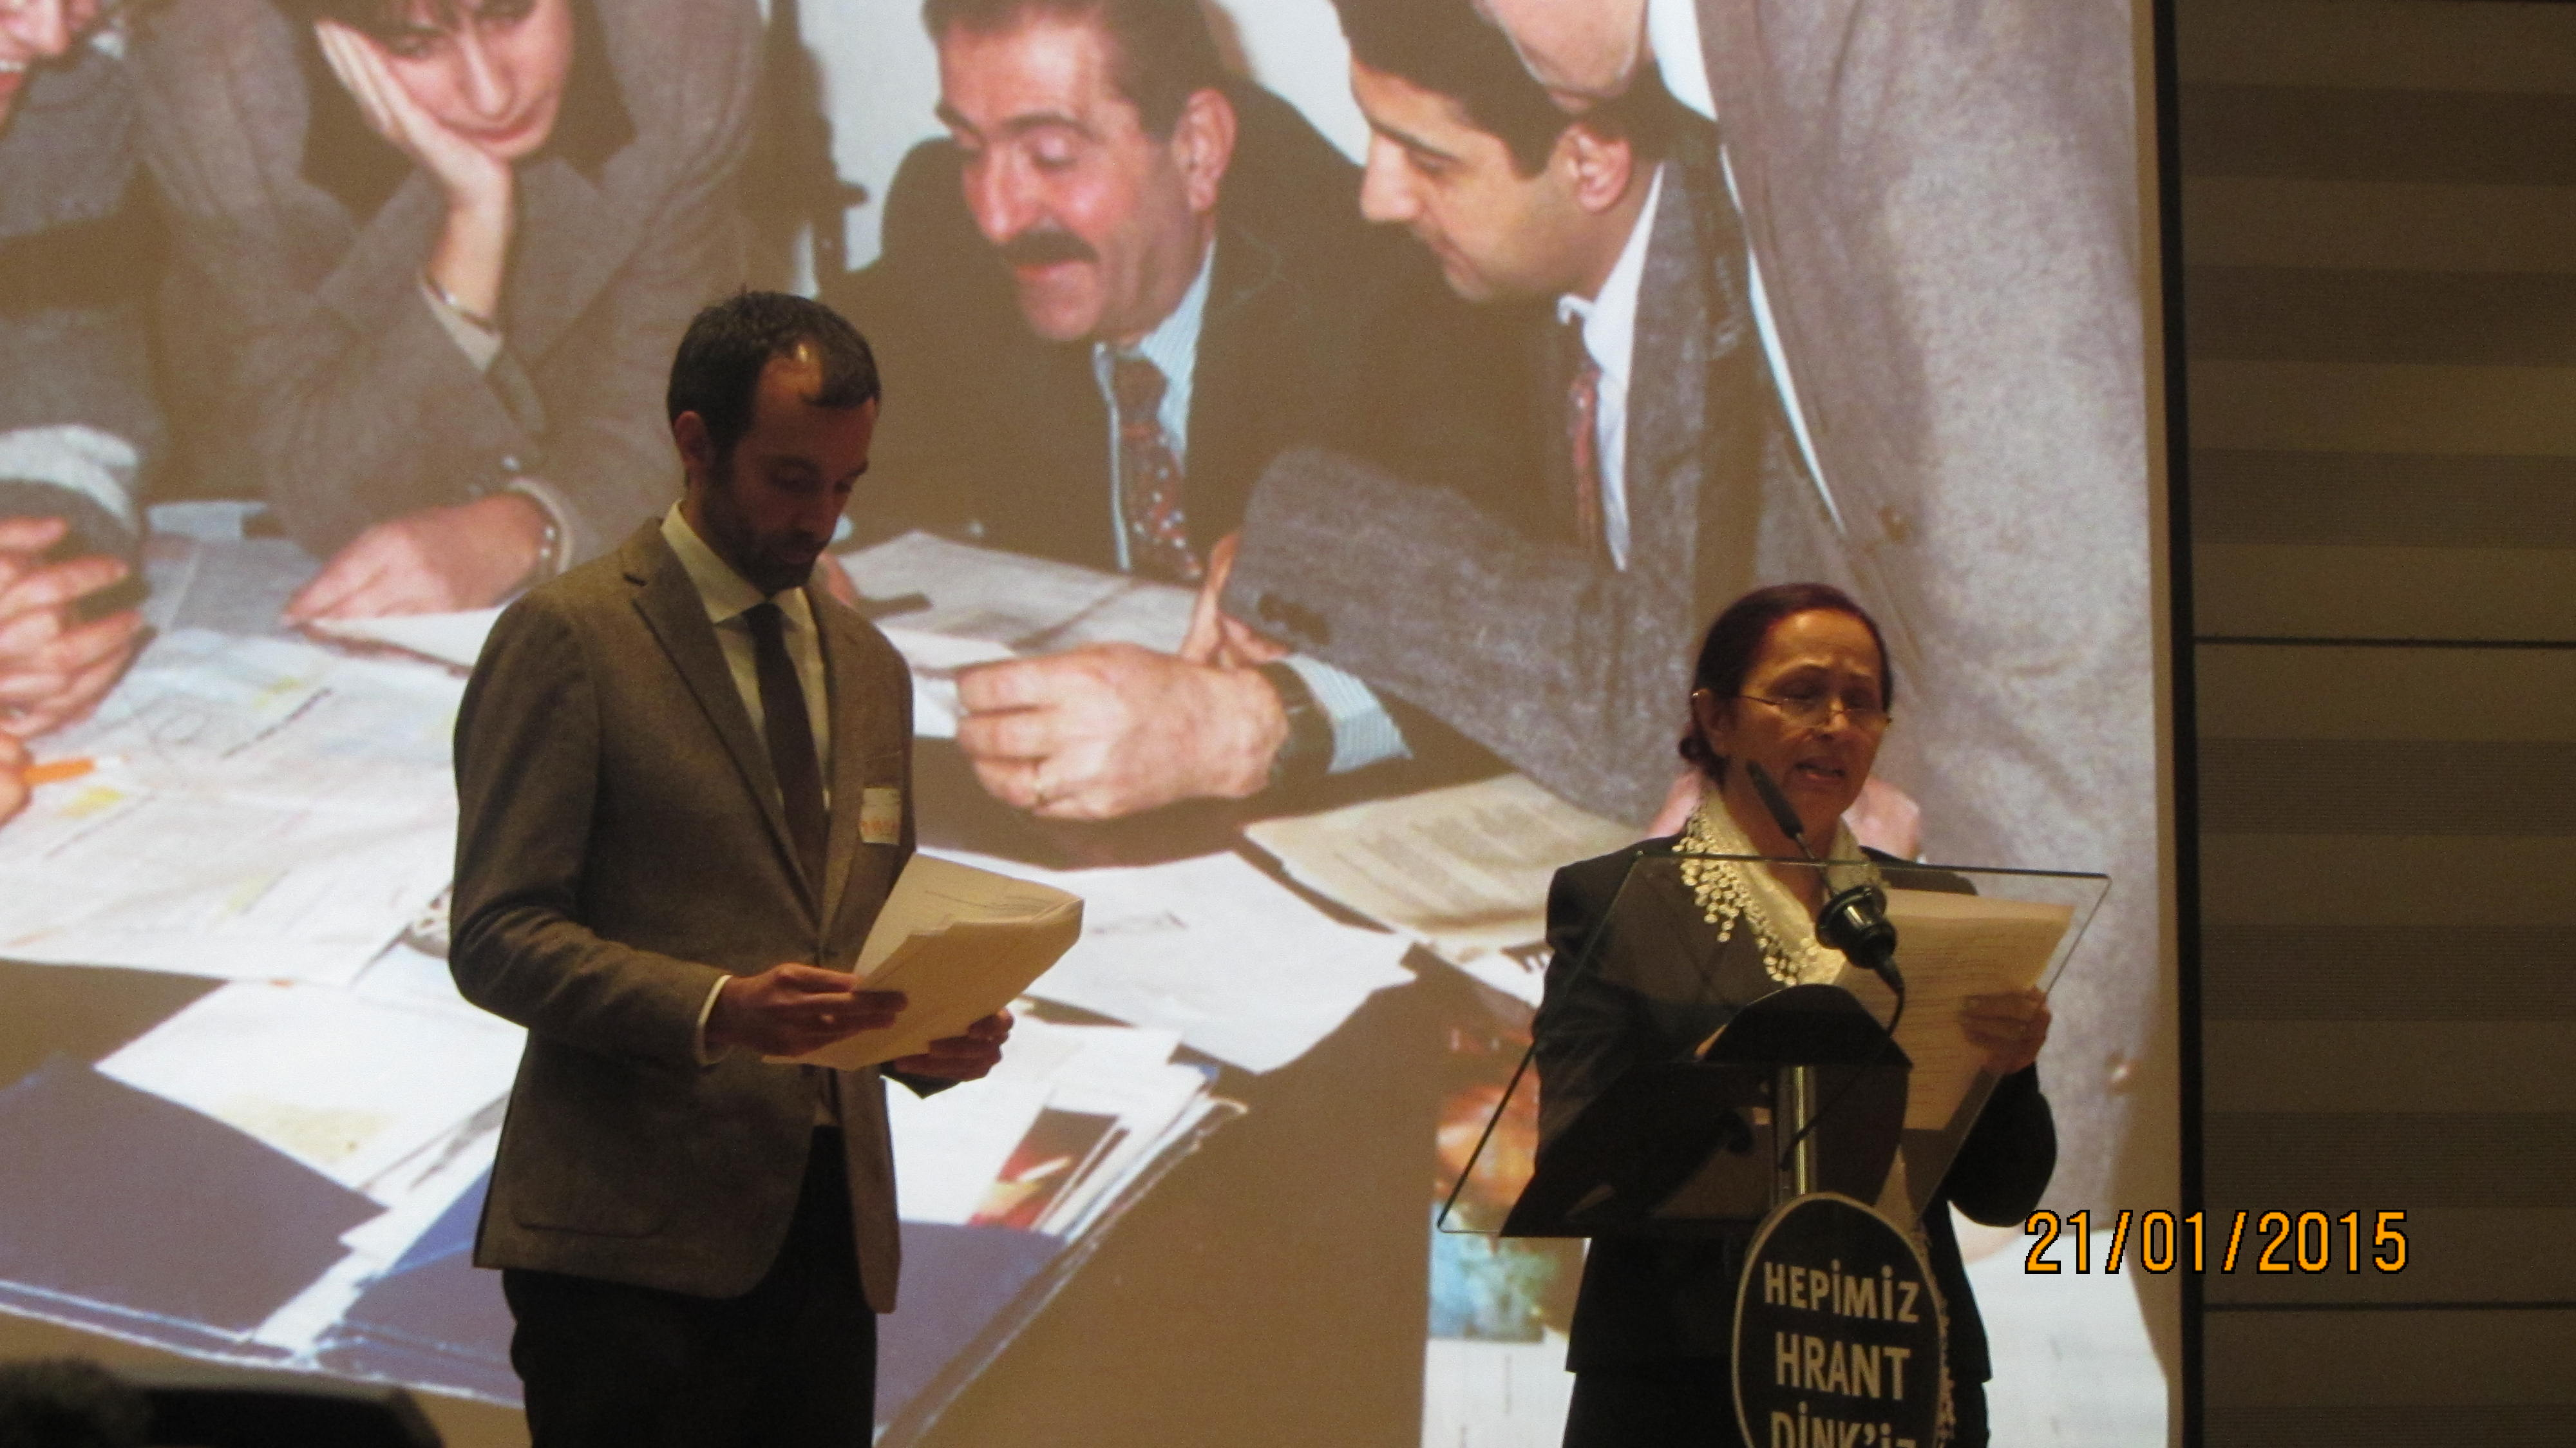 Parliament hosts commemoration for assassinated Journalist Hrant Dink